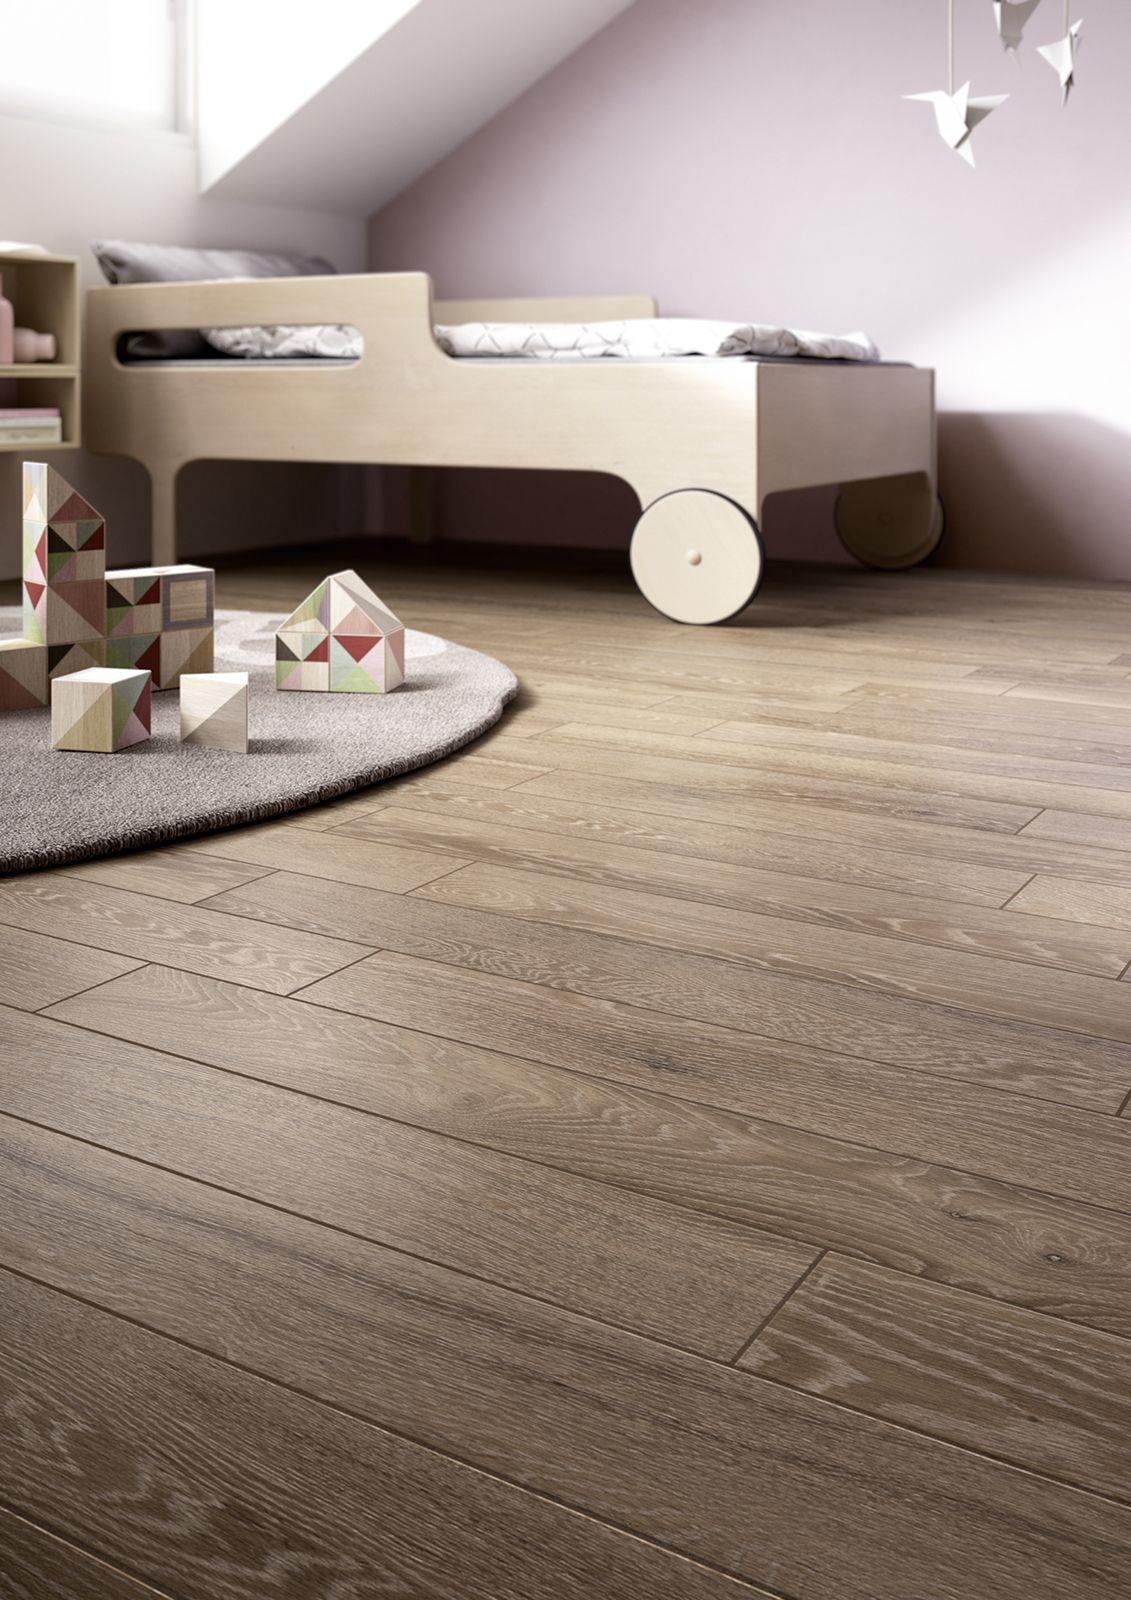 Marazzi Treverkcharme Brown | Timber Look Tile | Available at Ceramo ...